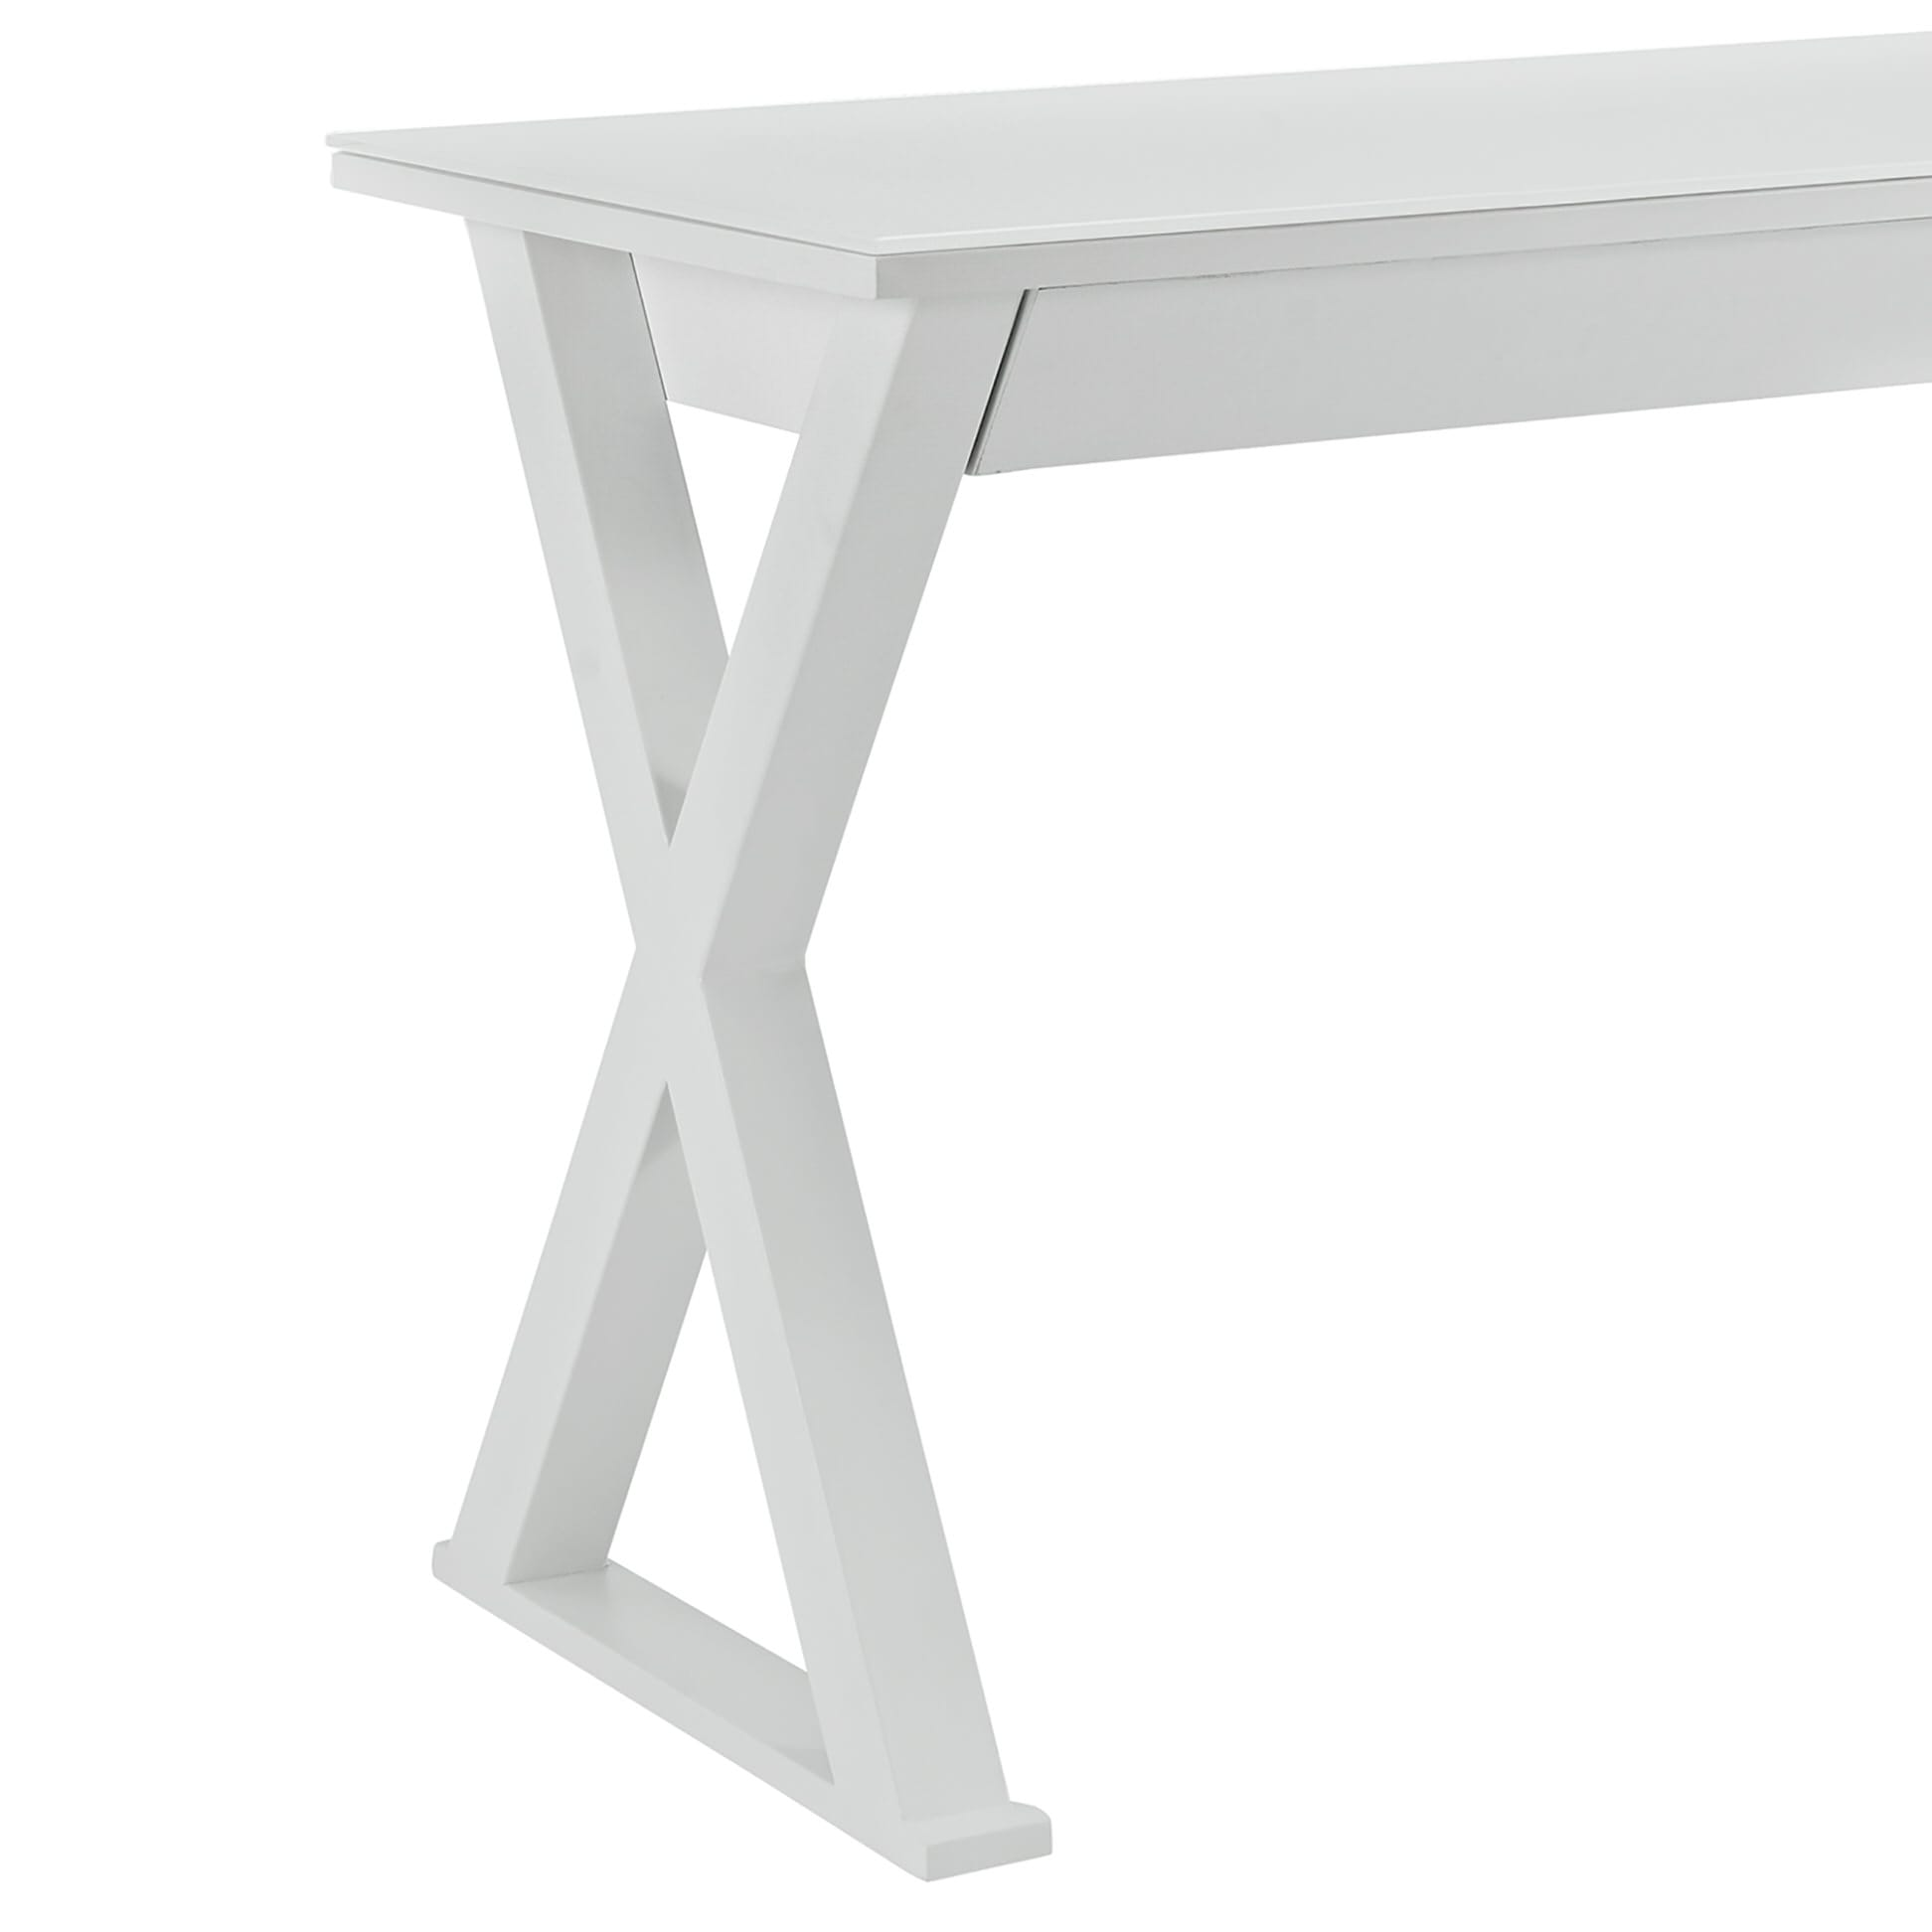 Miraculous Xtra 48 Inch Computer Desk White By Walker Edison Interior Design Ideas Skatsoteloinfo